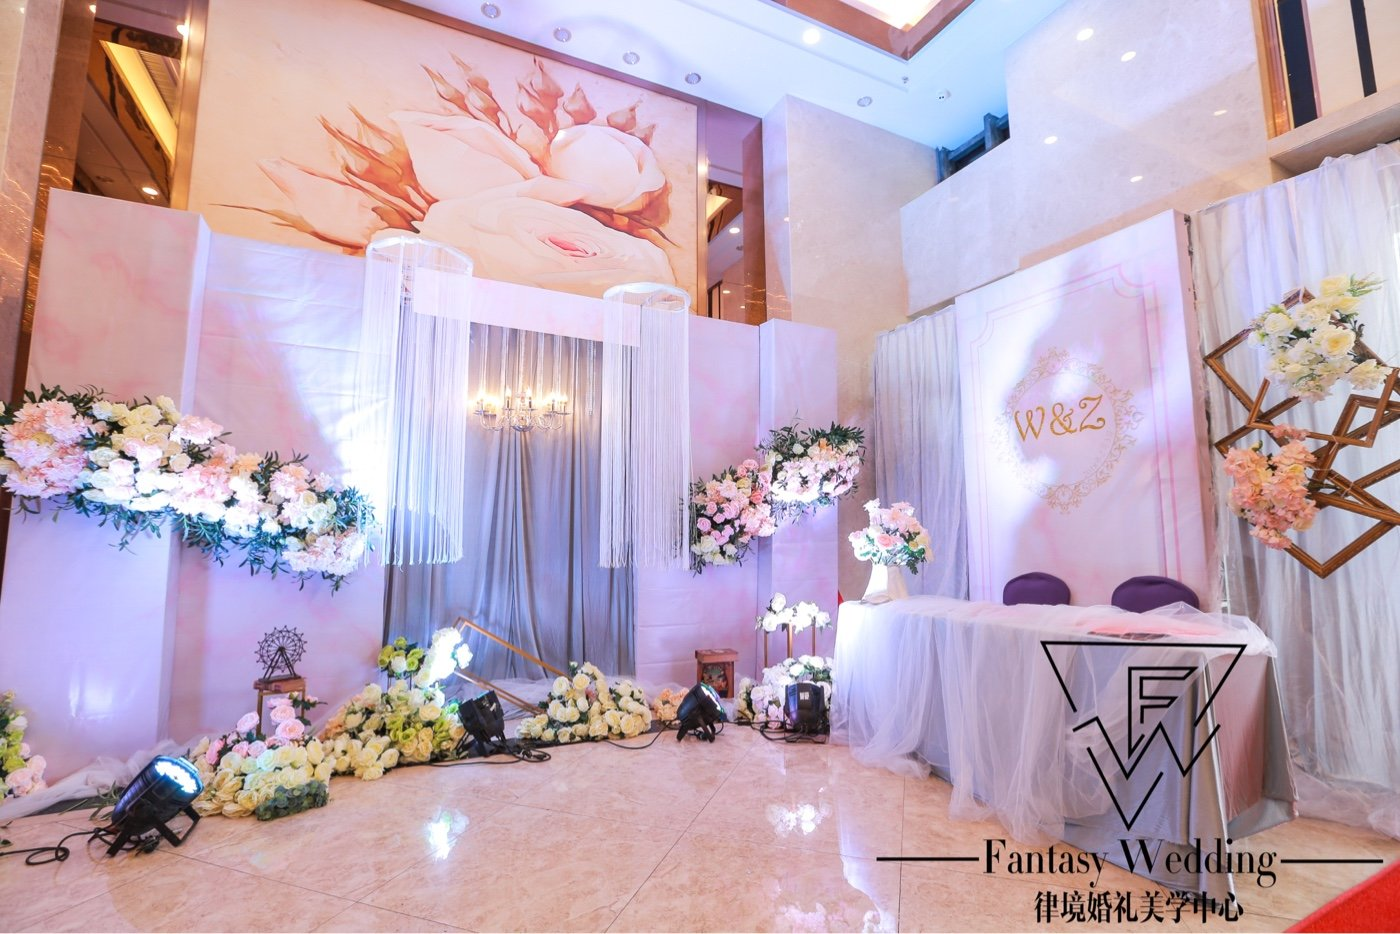 「Fantasy Wedding」&琪瑞康郡「遇见」主题8